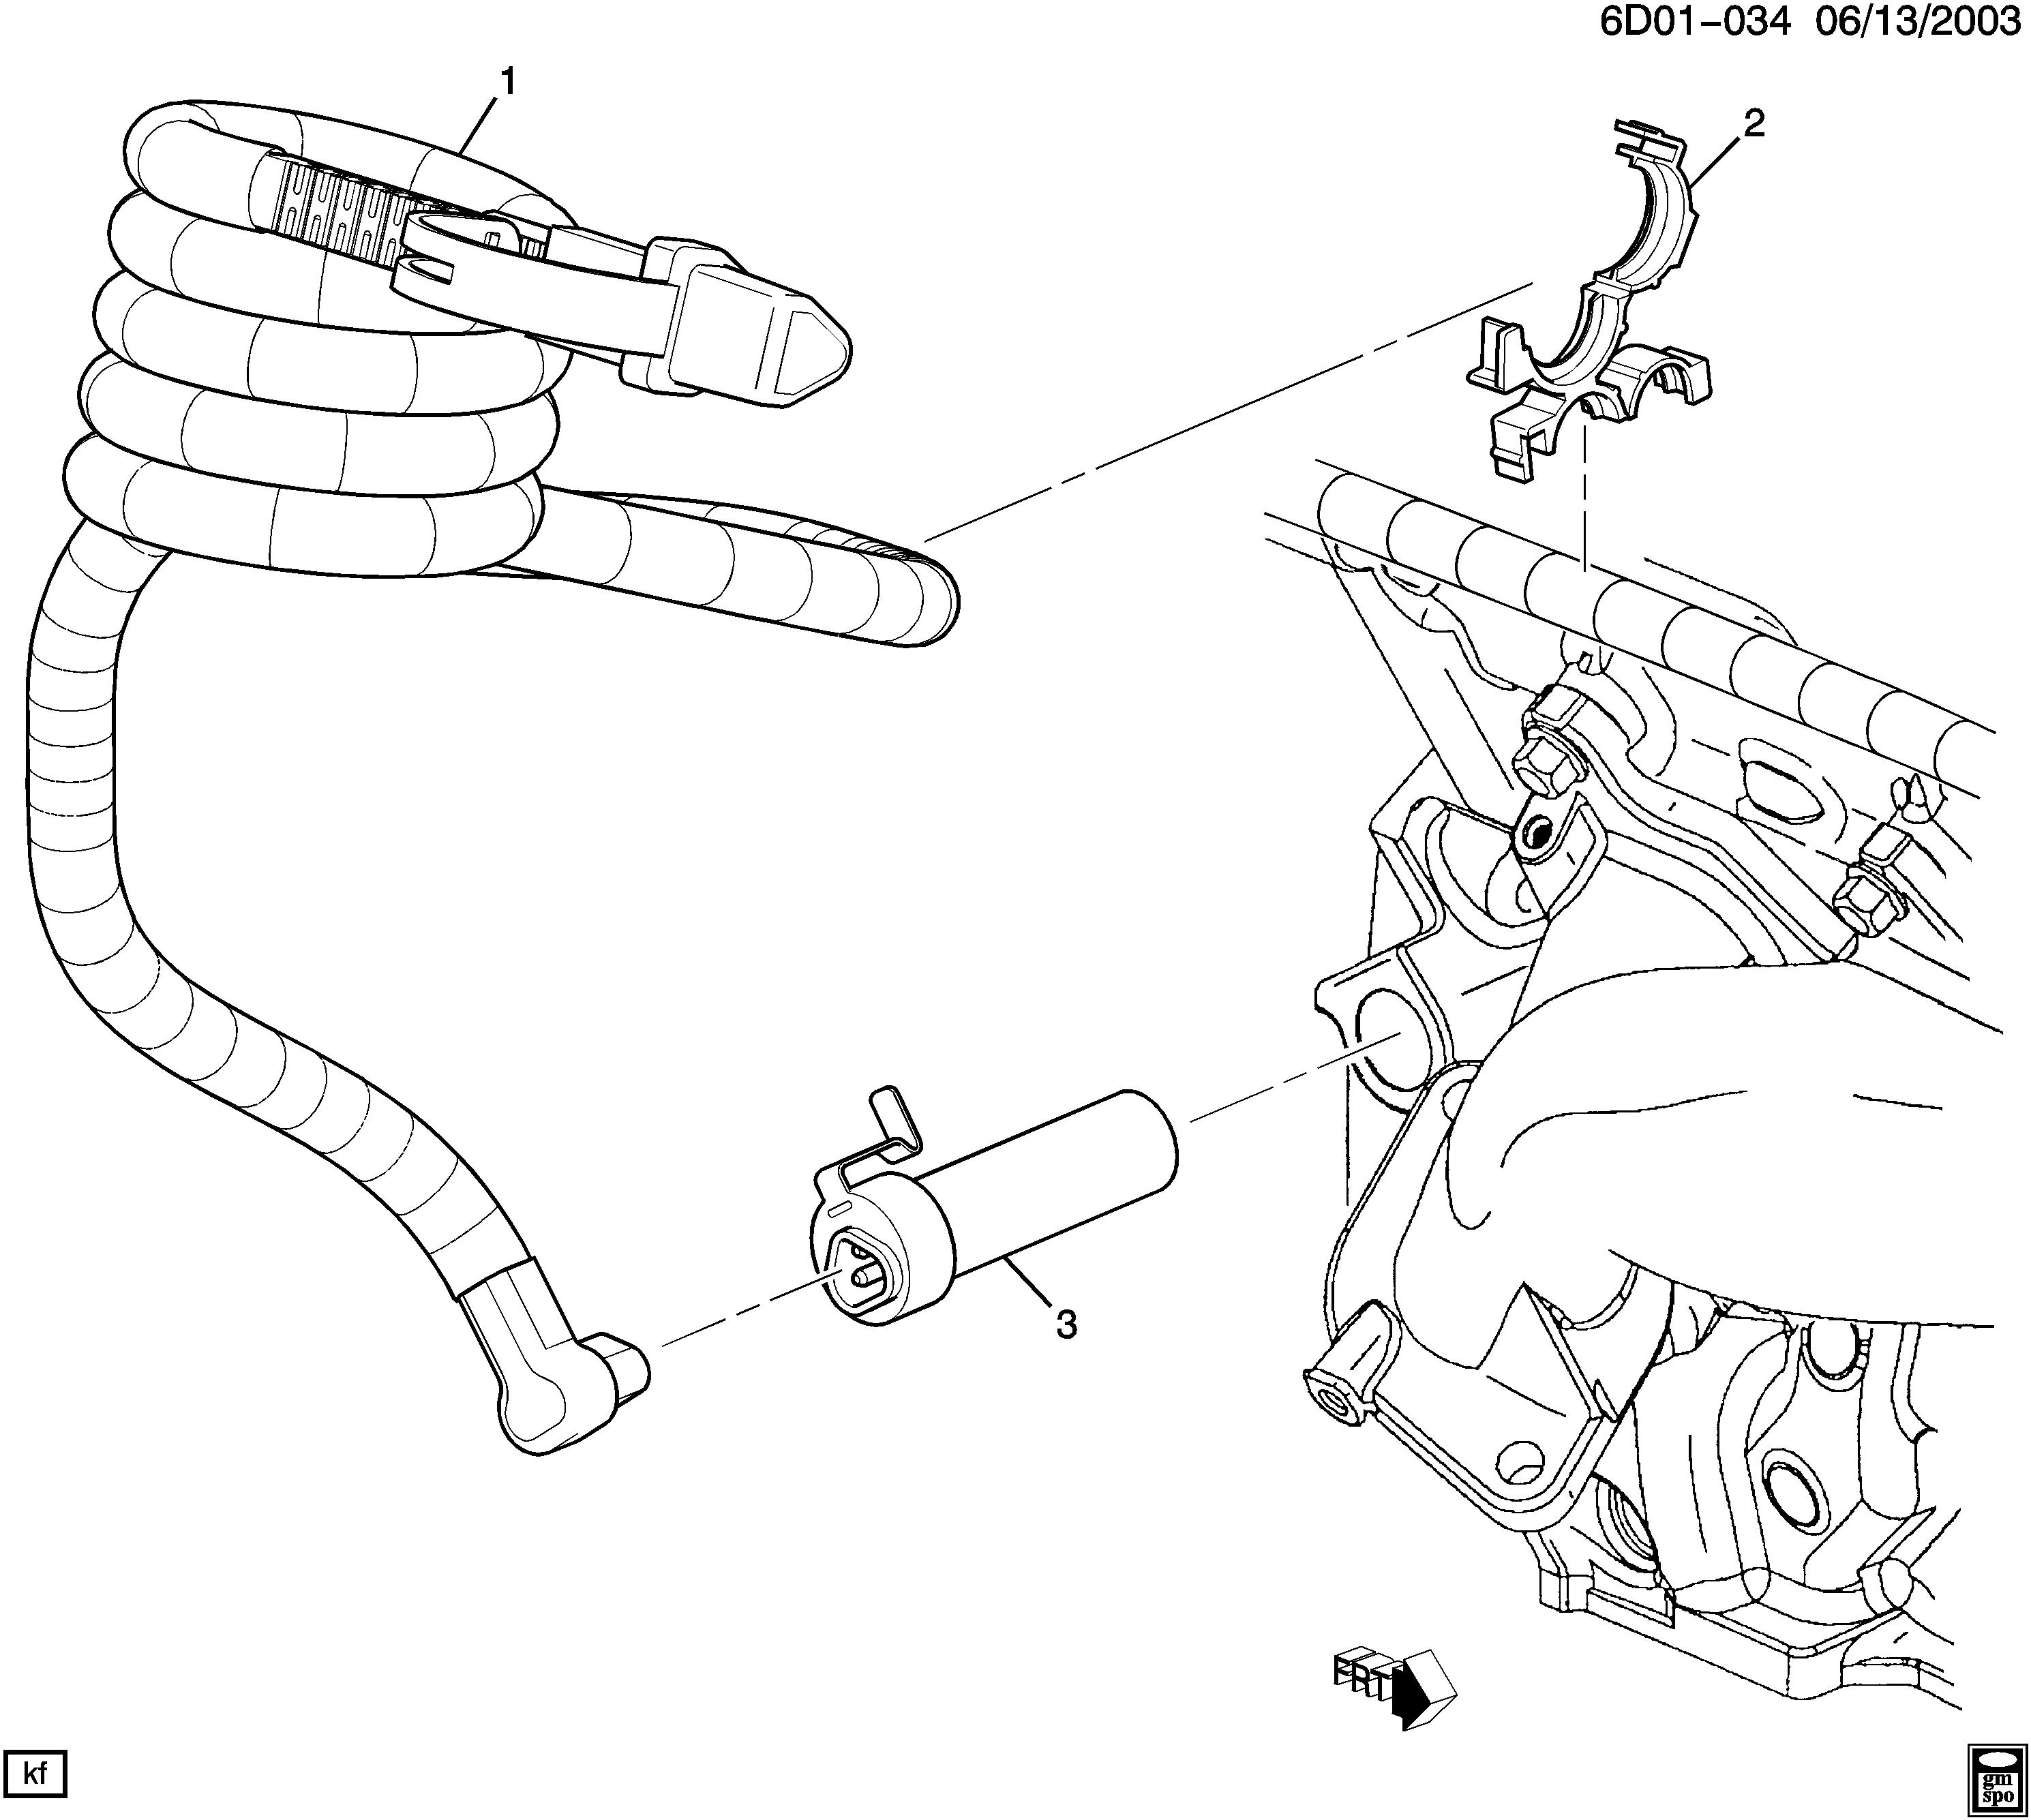 Cadillac Cts D Engine Block Heater Ly7 36 7 110v K05 Spare Parts Catalog Epc